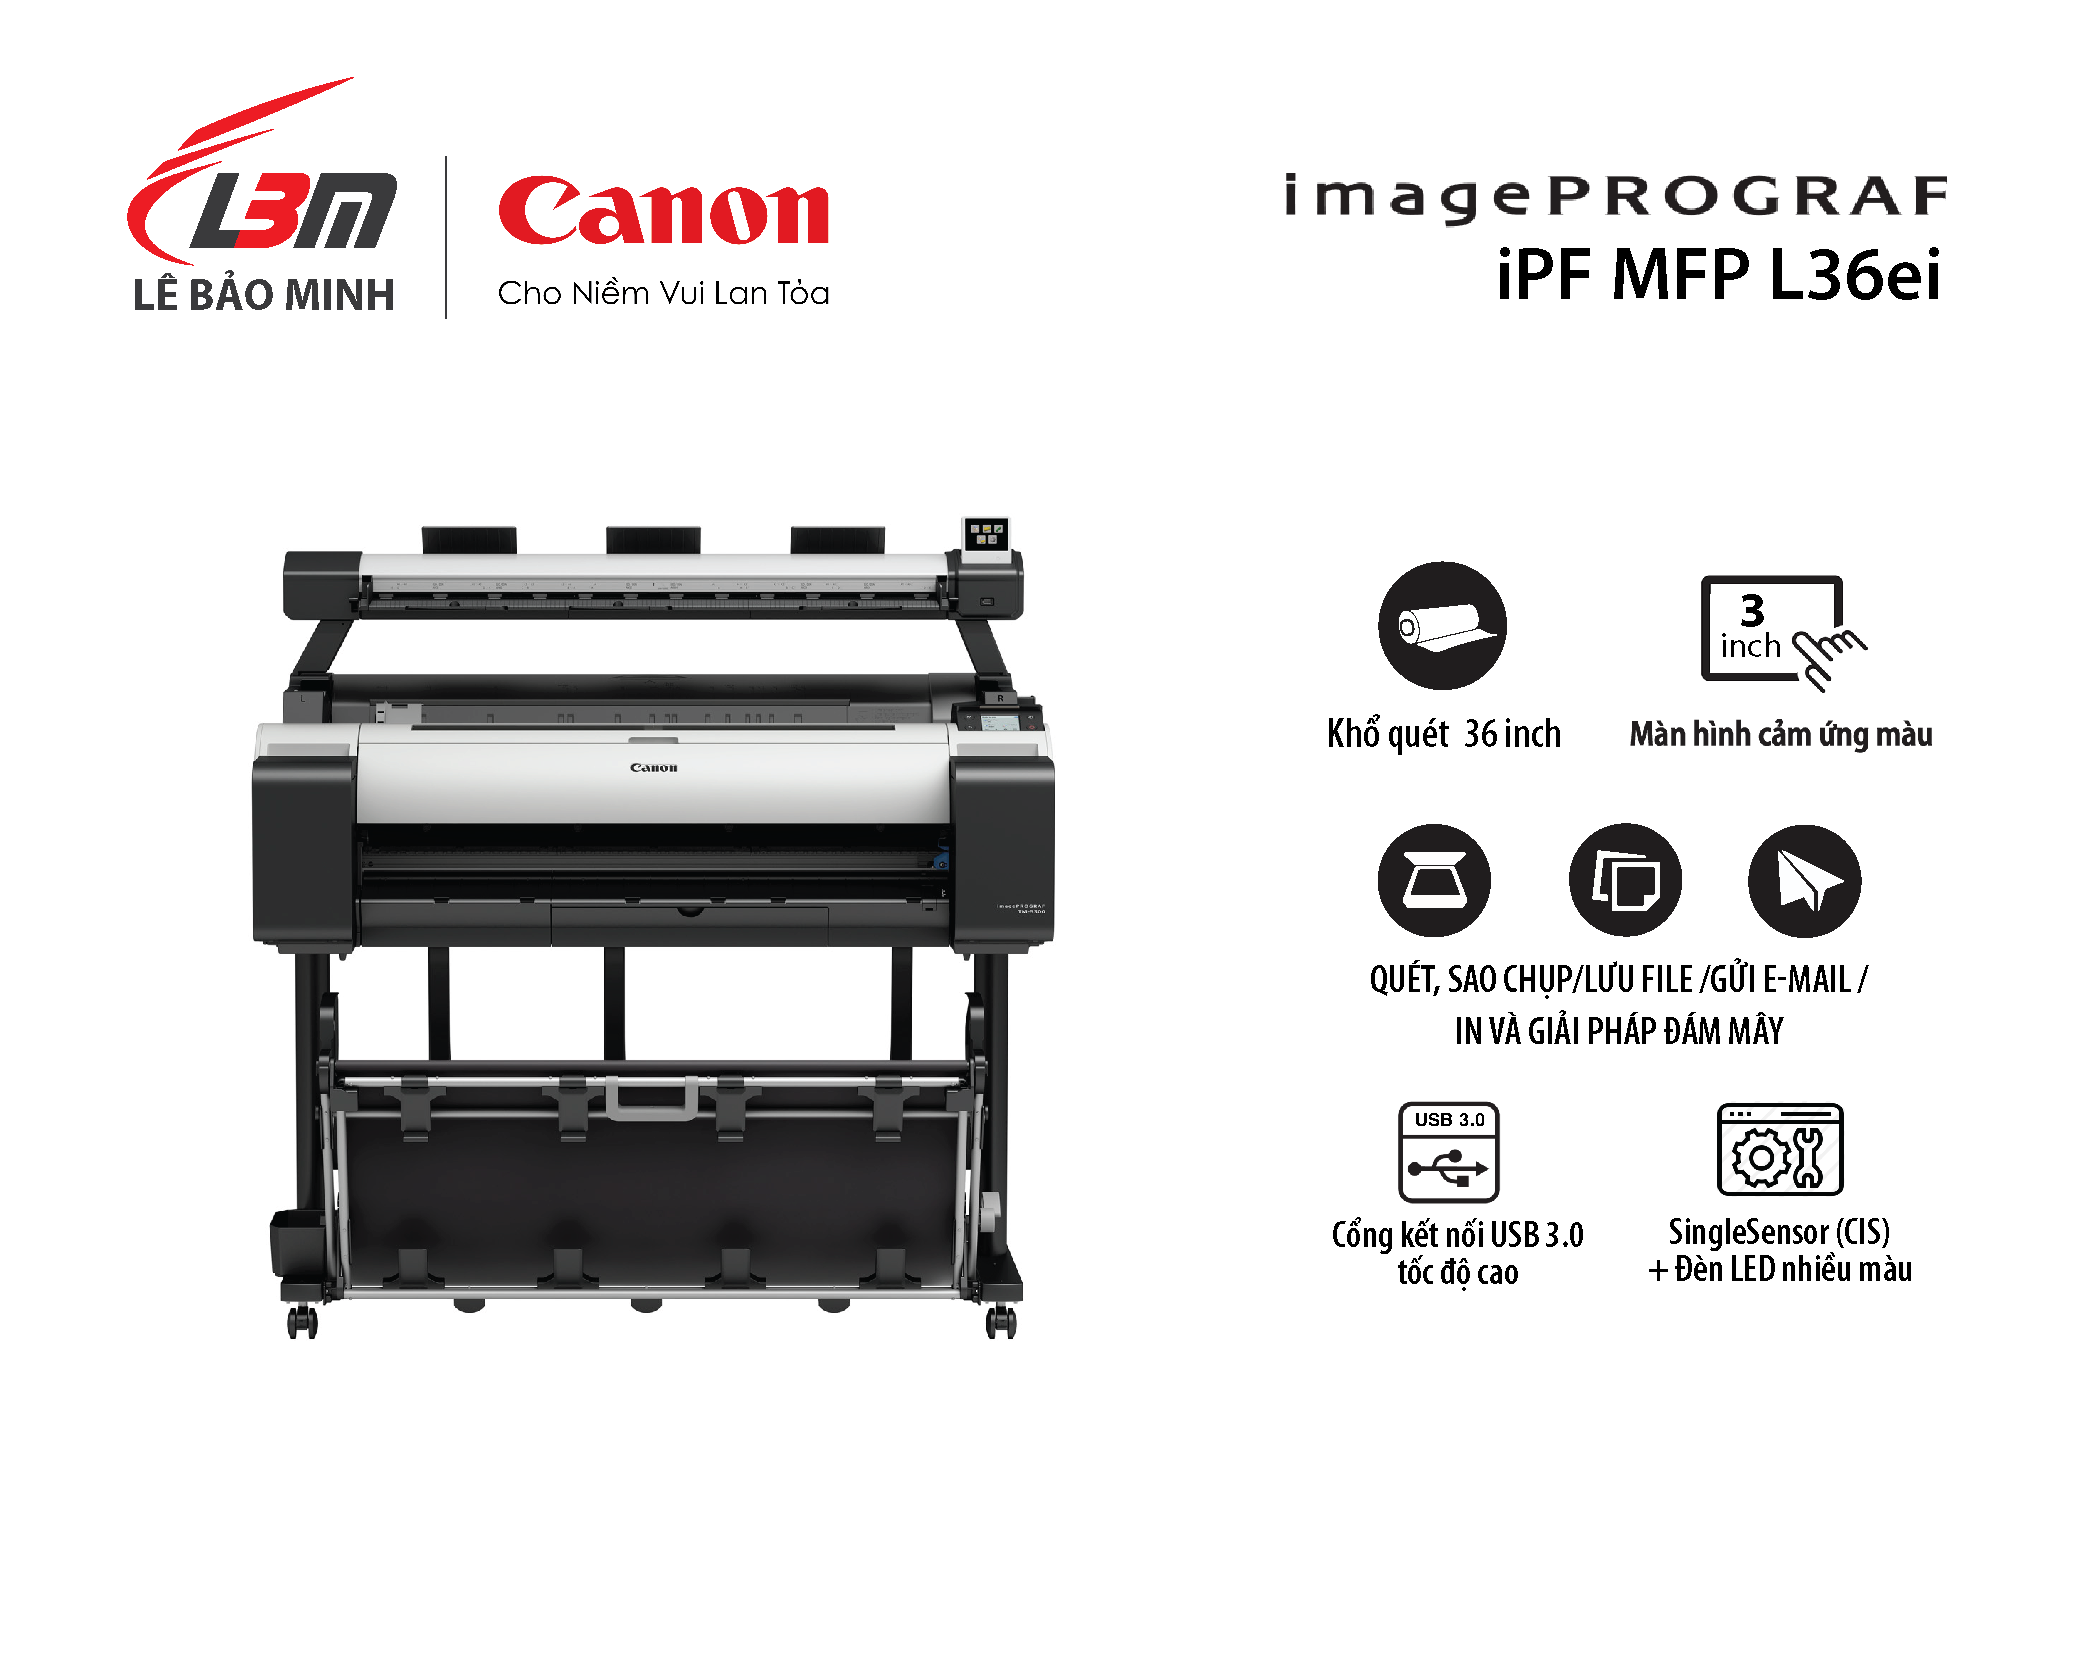 imagePROGRAF iPF MFP L36ei (dùng cho máy TM-5300 / TM-5305)